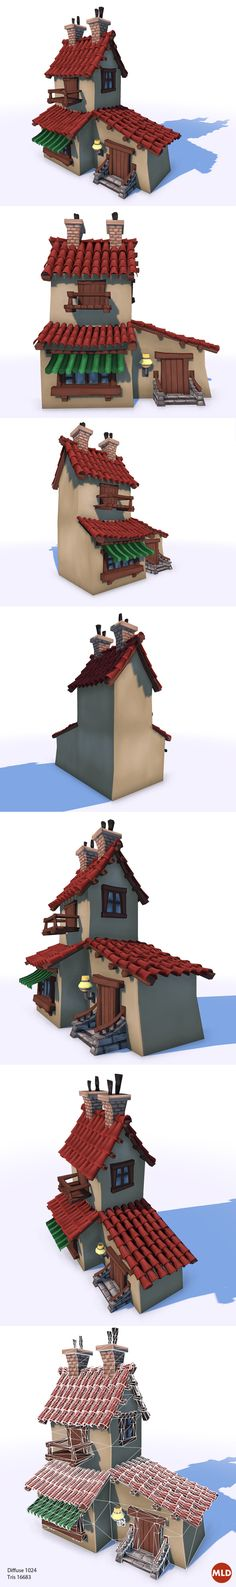 Low Poly Cartoon House